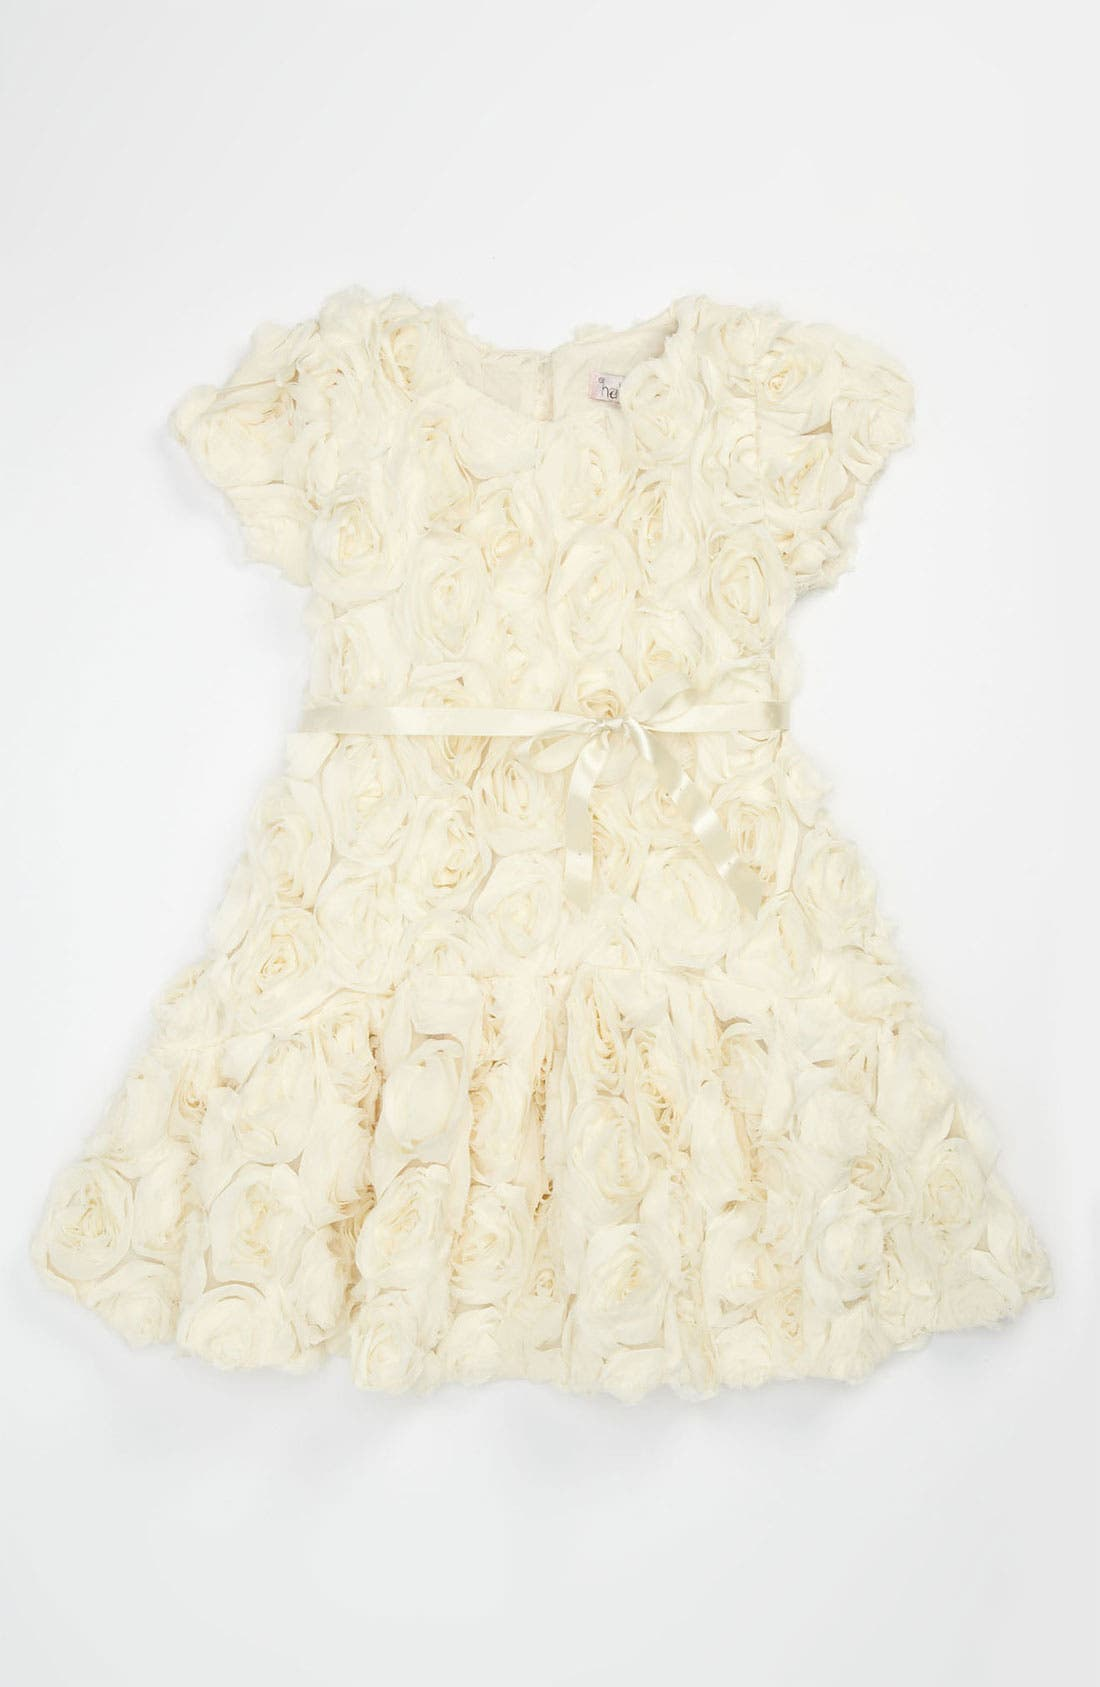 Alternate Image 1 Selected - Halabaloo 'Bouquet' Dress (Little Girls & Big Girls)